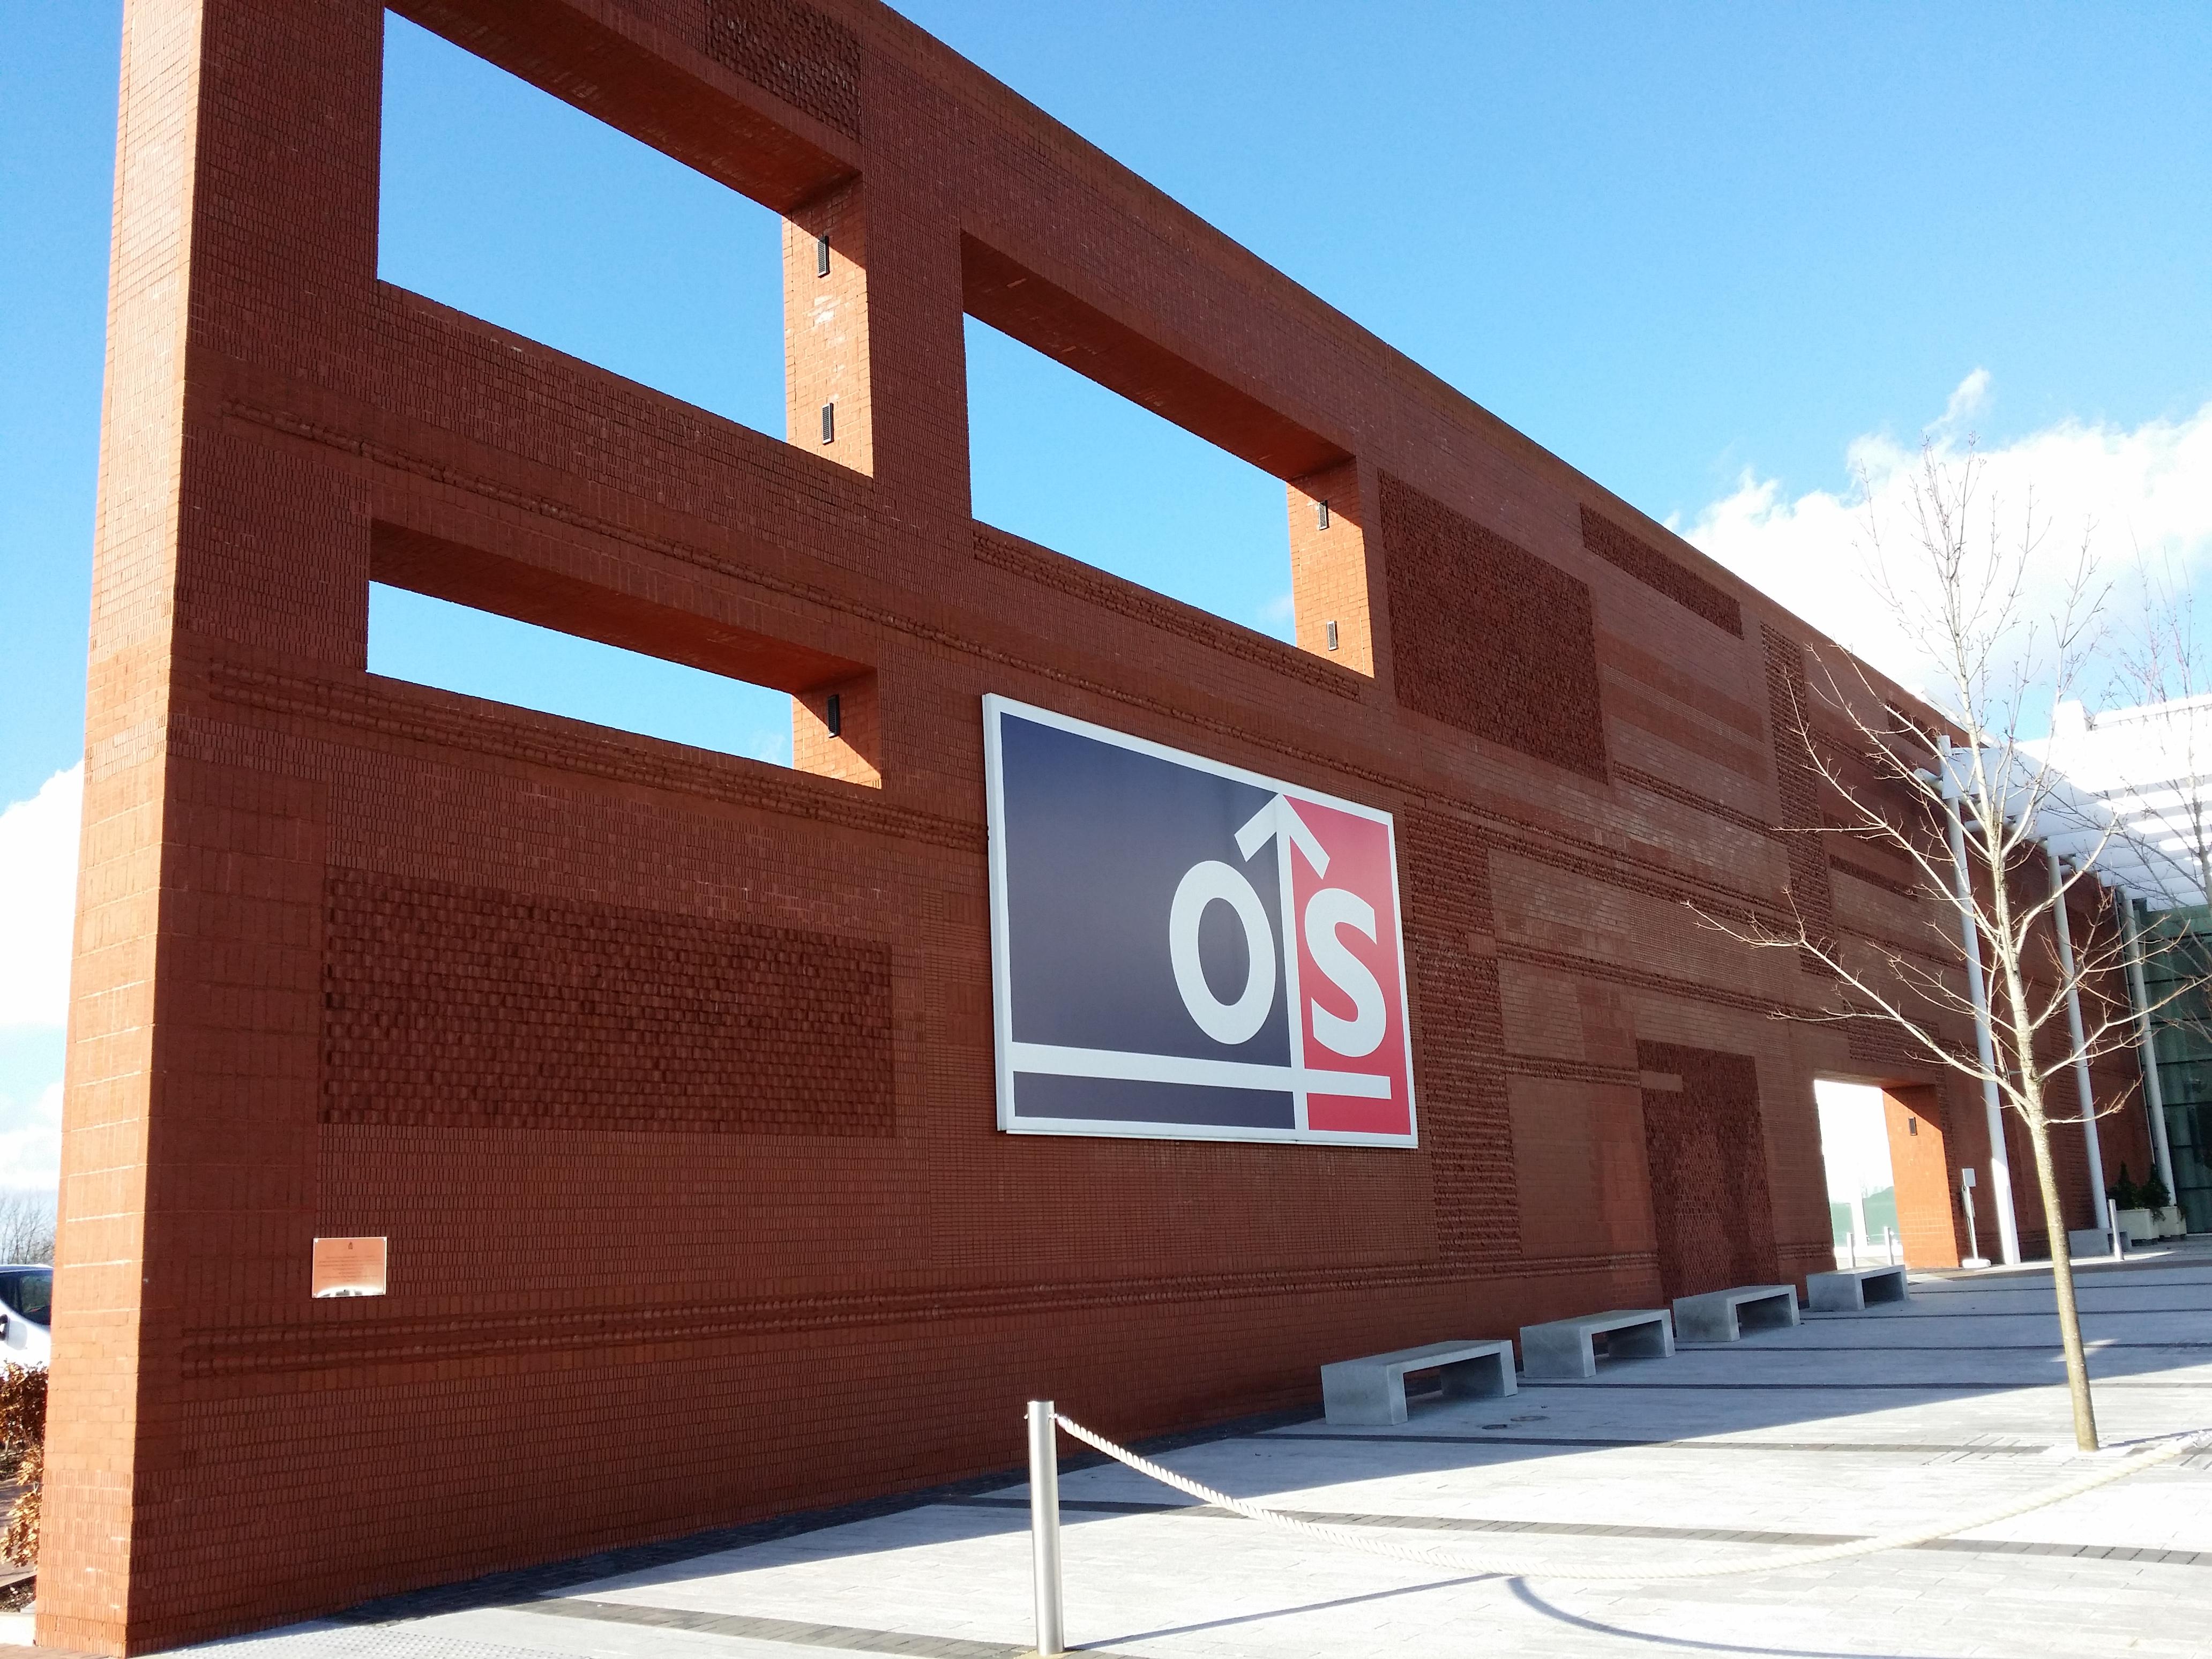 OS HQ entrance